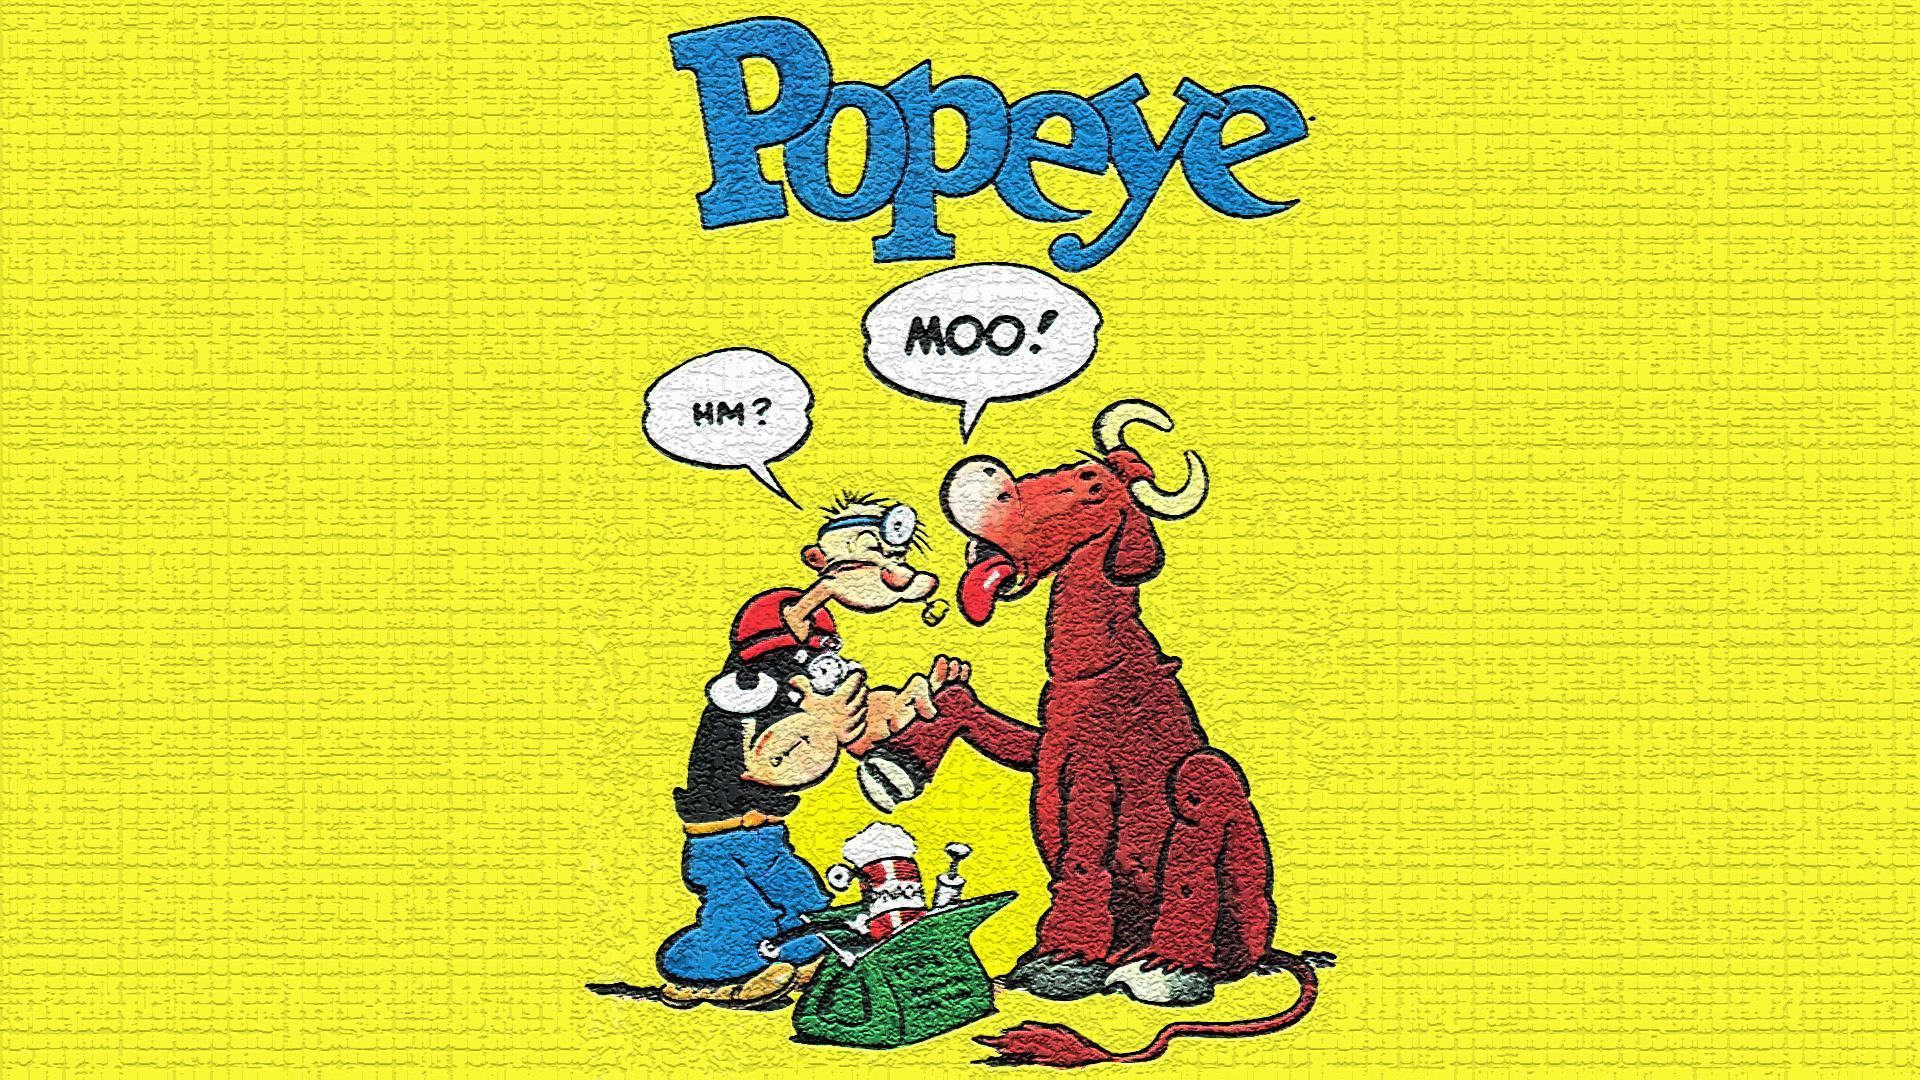 Popeye Comics wallpapers HD quality